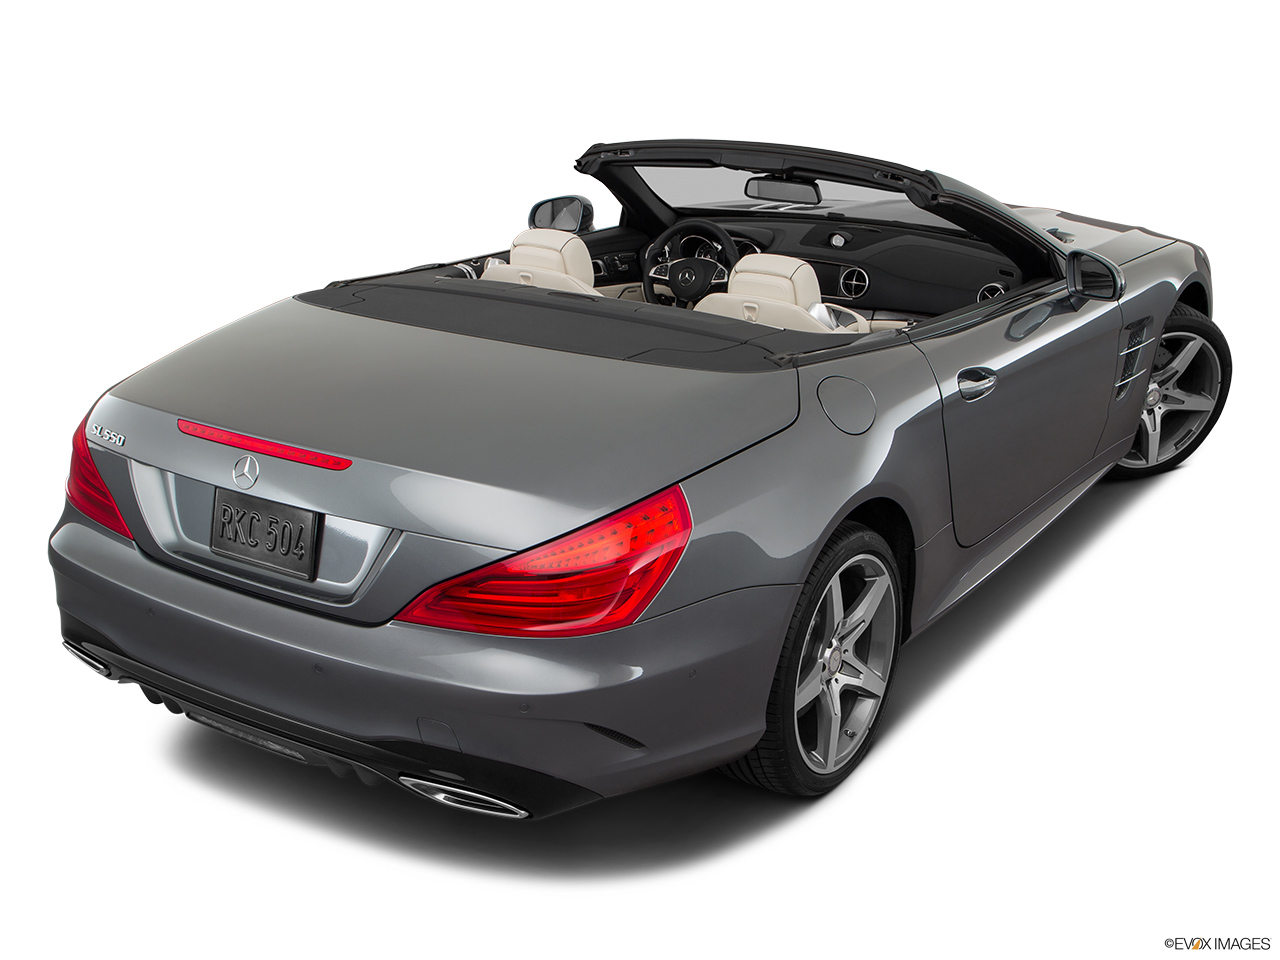 car pictures list for mercedes benz sl class 2018 sl 500 bahrain yallamotor. Black Bedroom Furniture Sets. Home Design Ideas